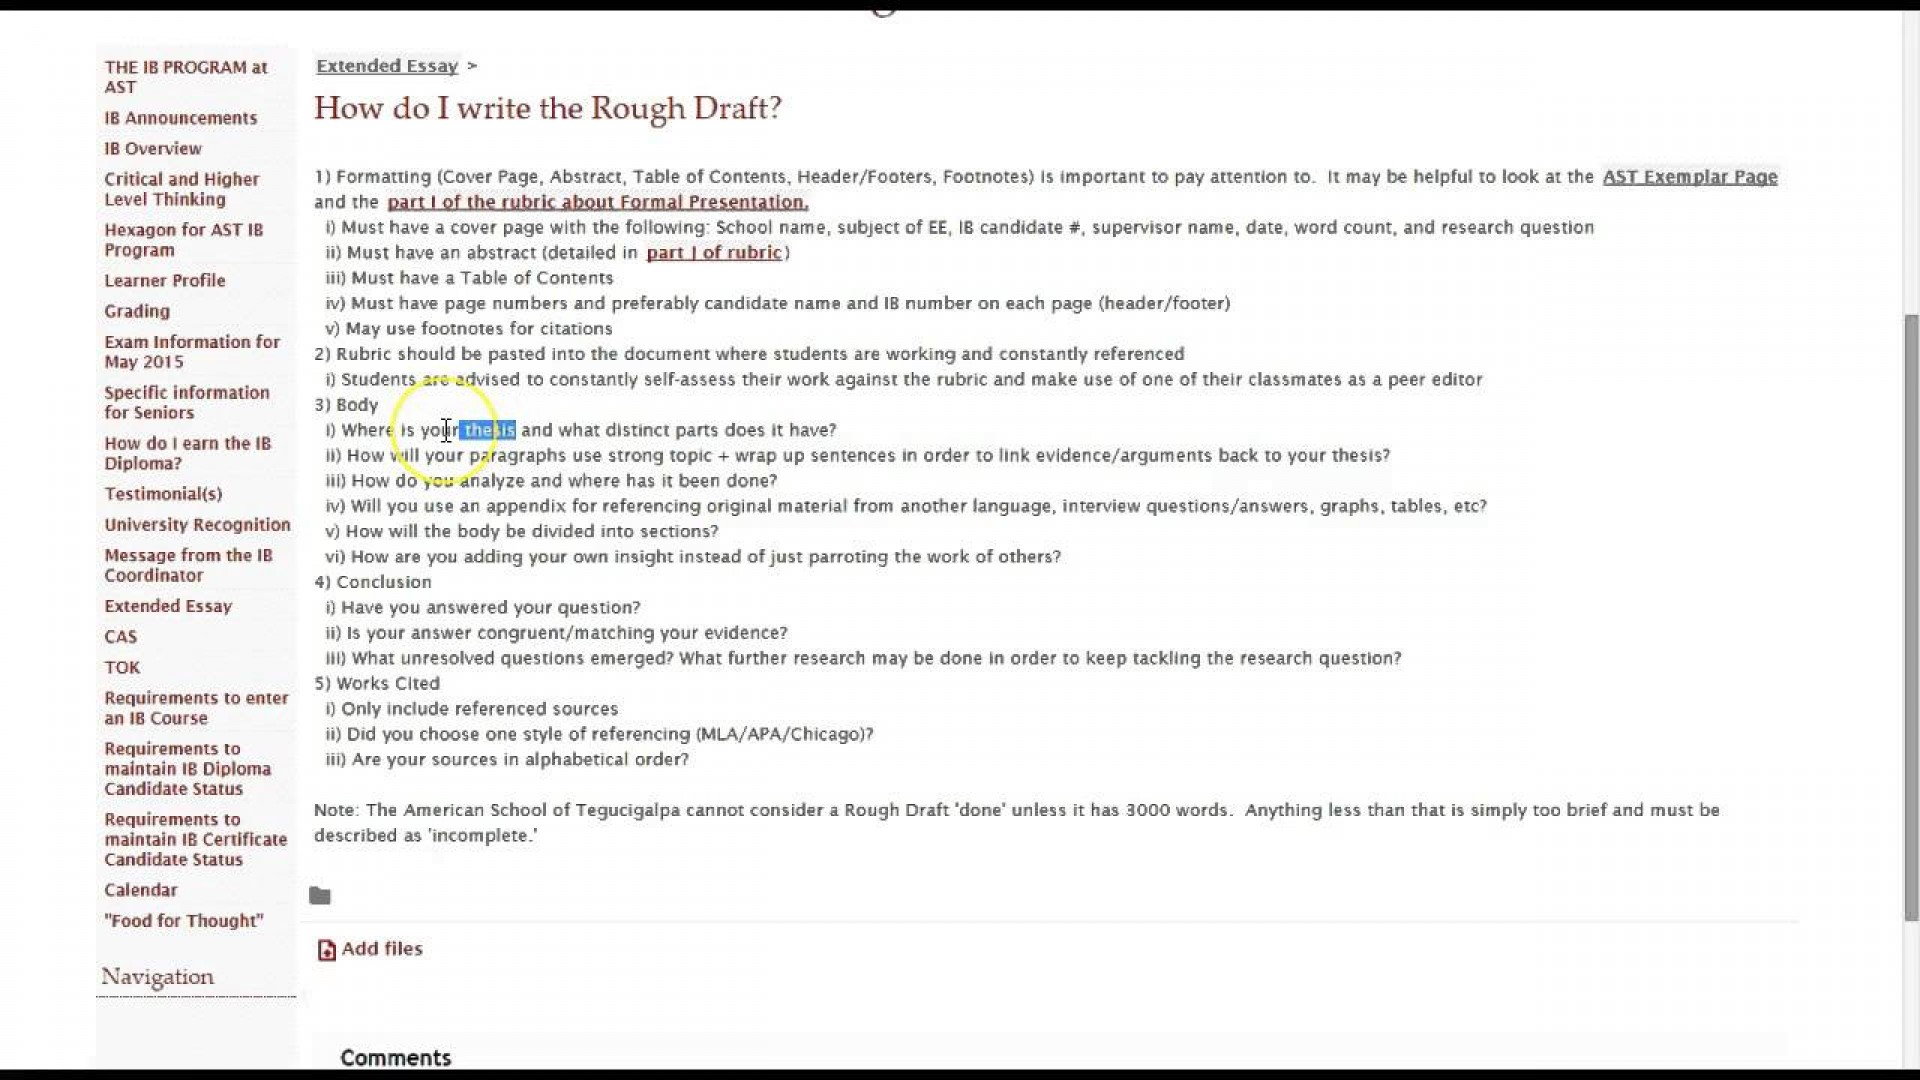 004 Maxresdefault Essay Example Ib Extended Impressive Topics Topic Ideas Biology English 1920